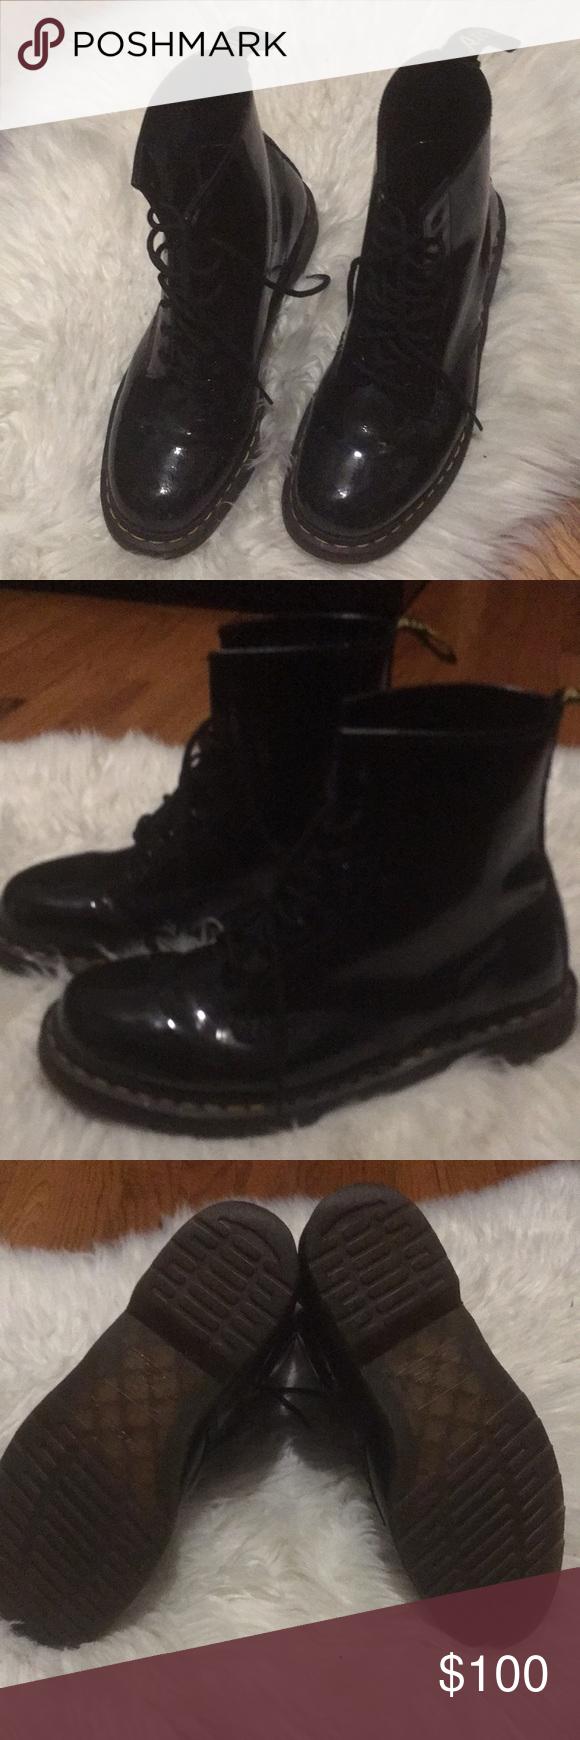 boots like doc martins